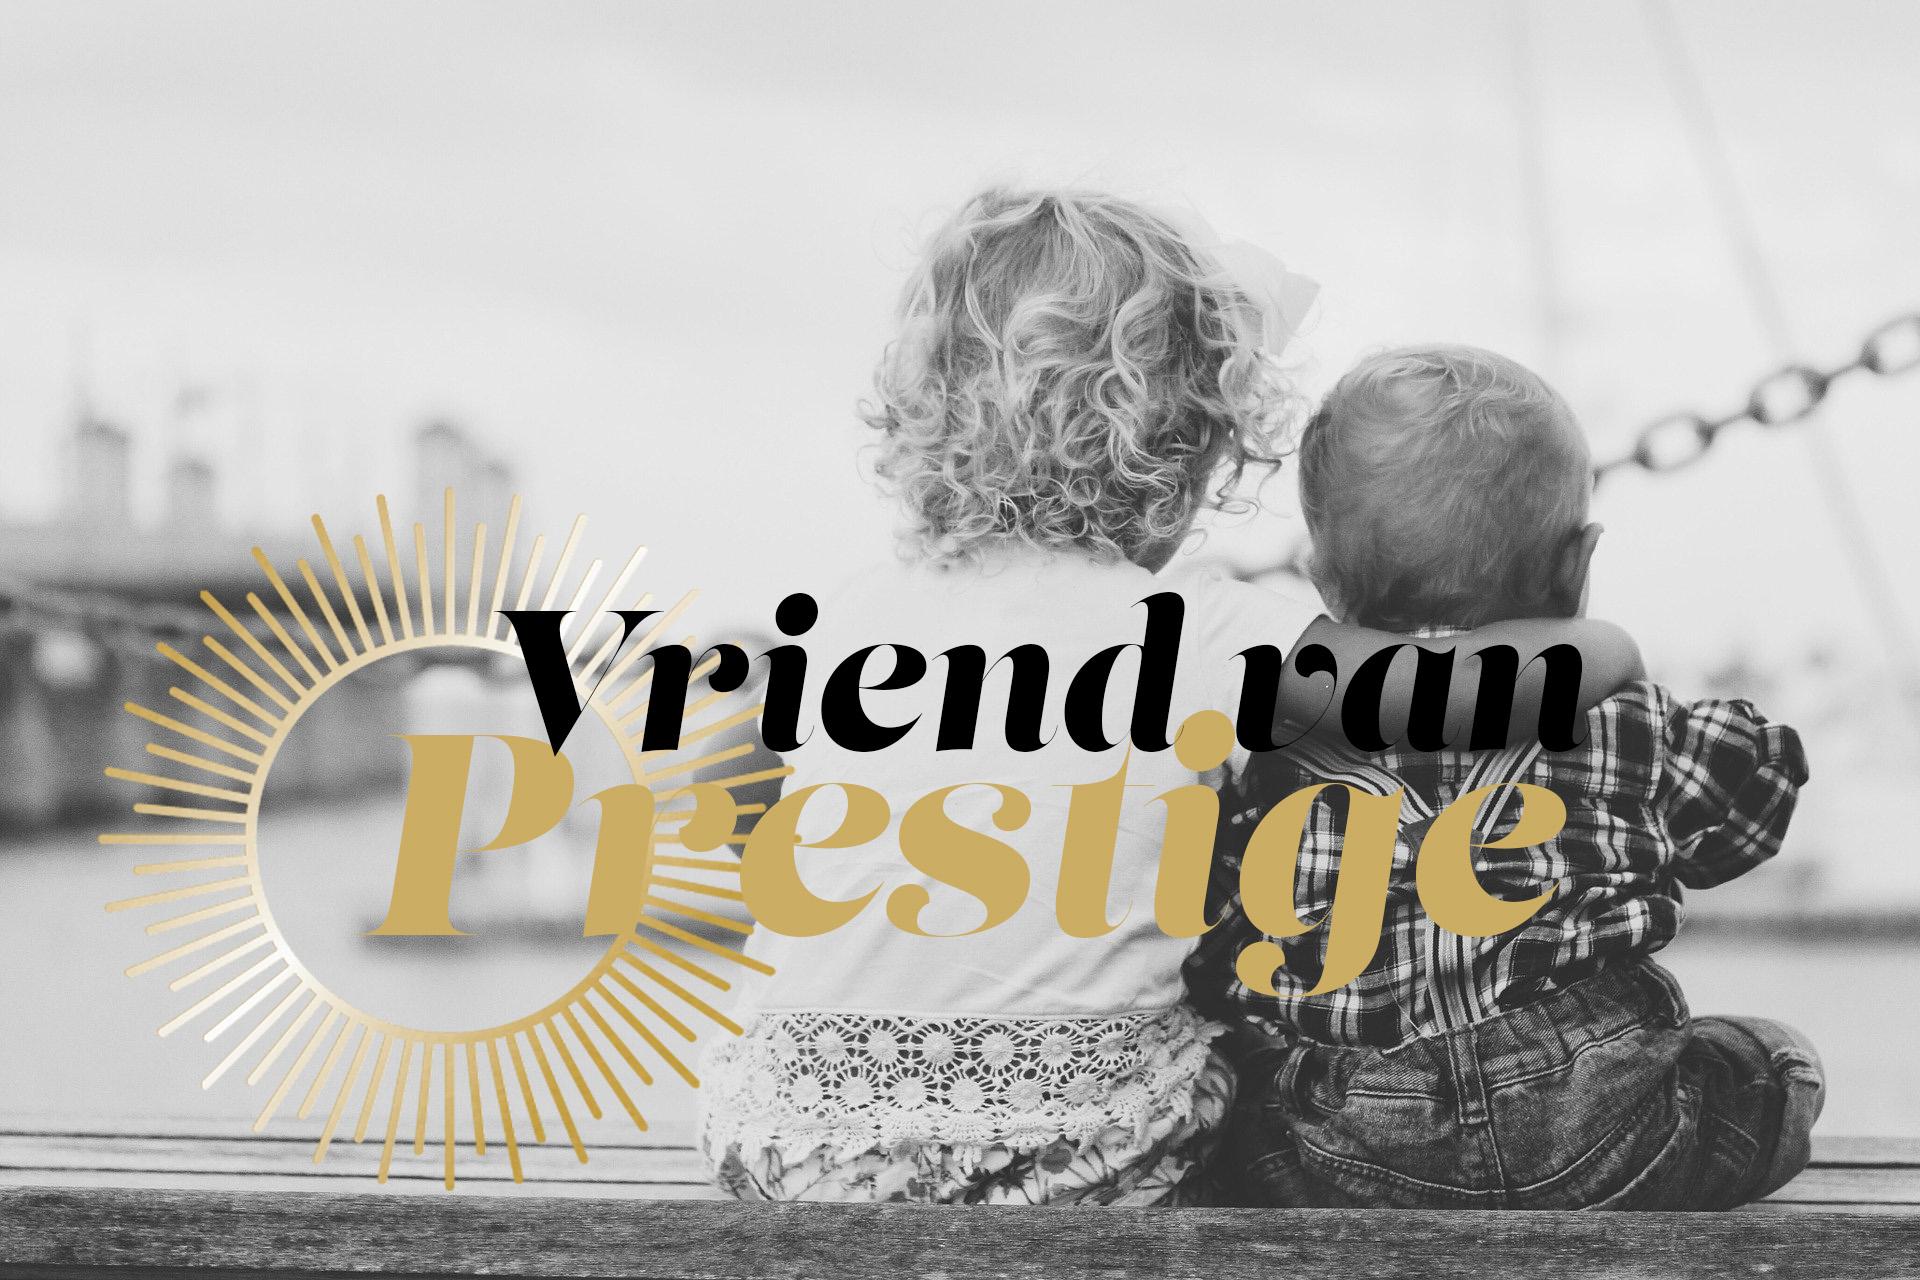 Vriend van Prestige